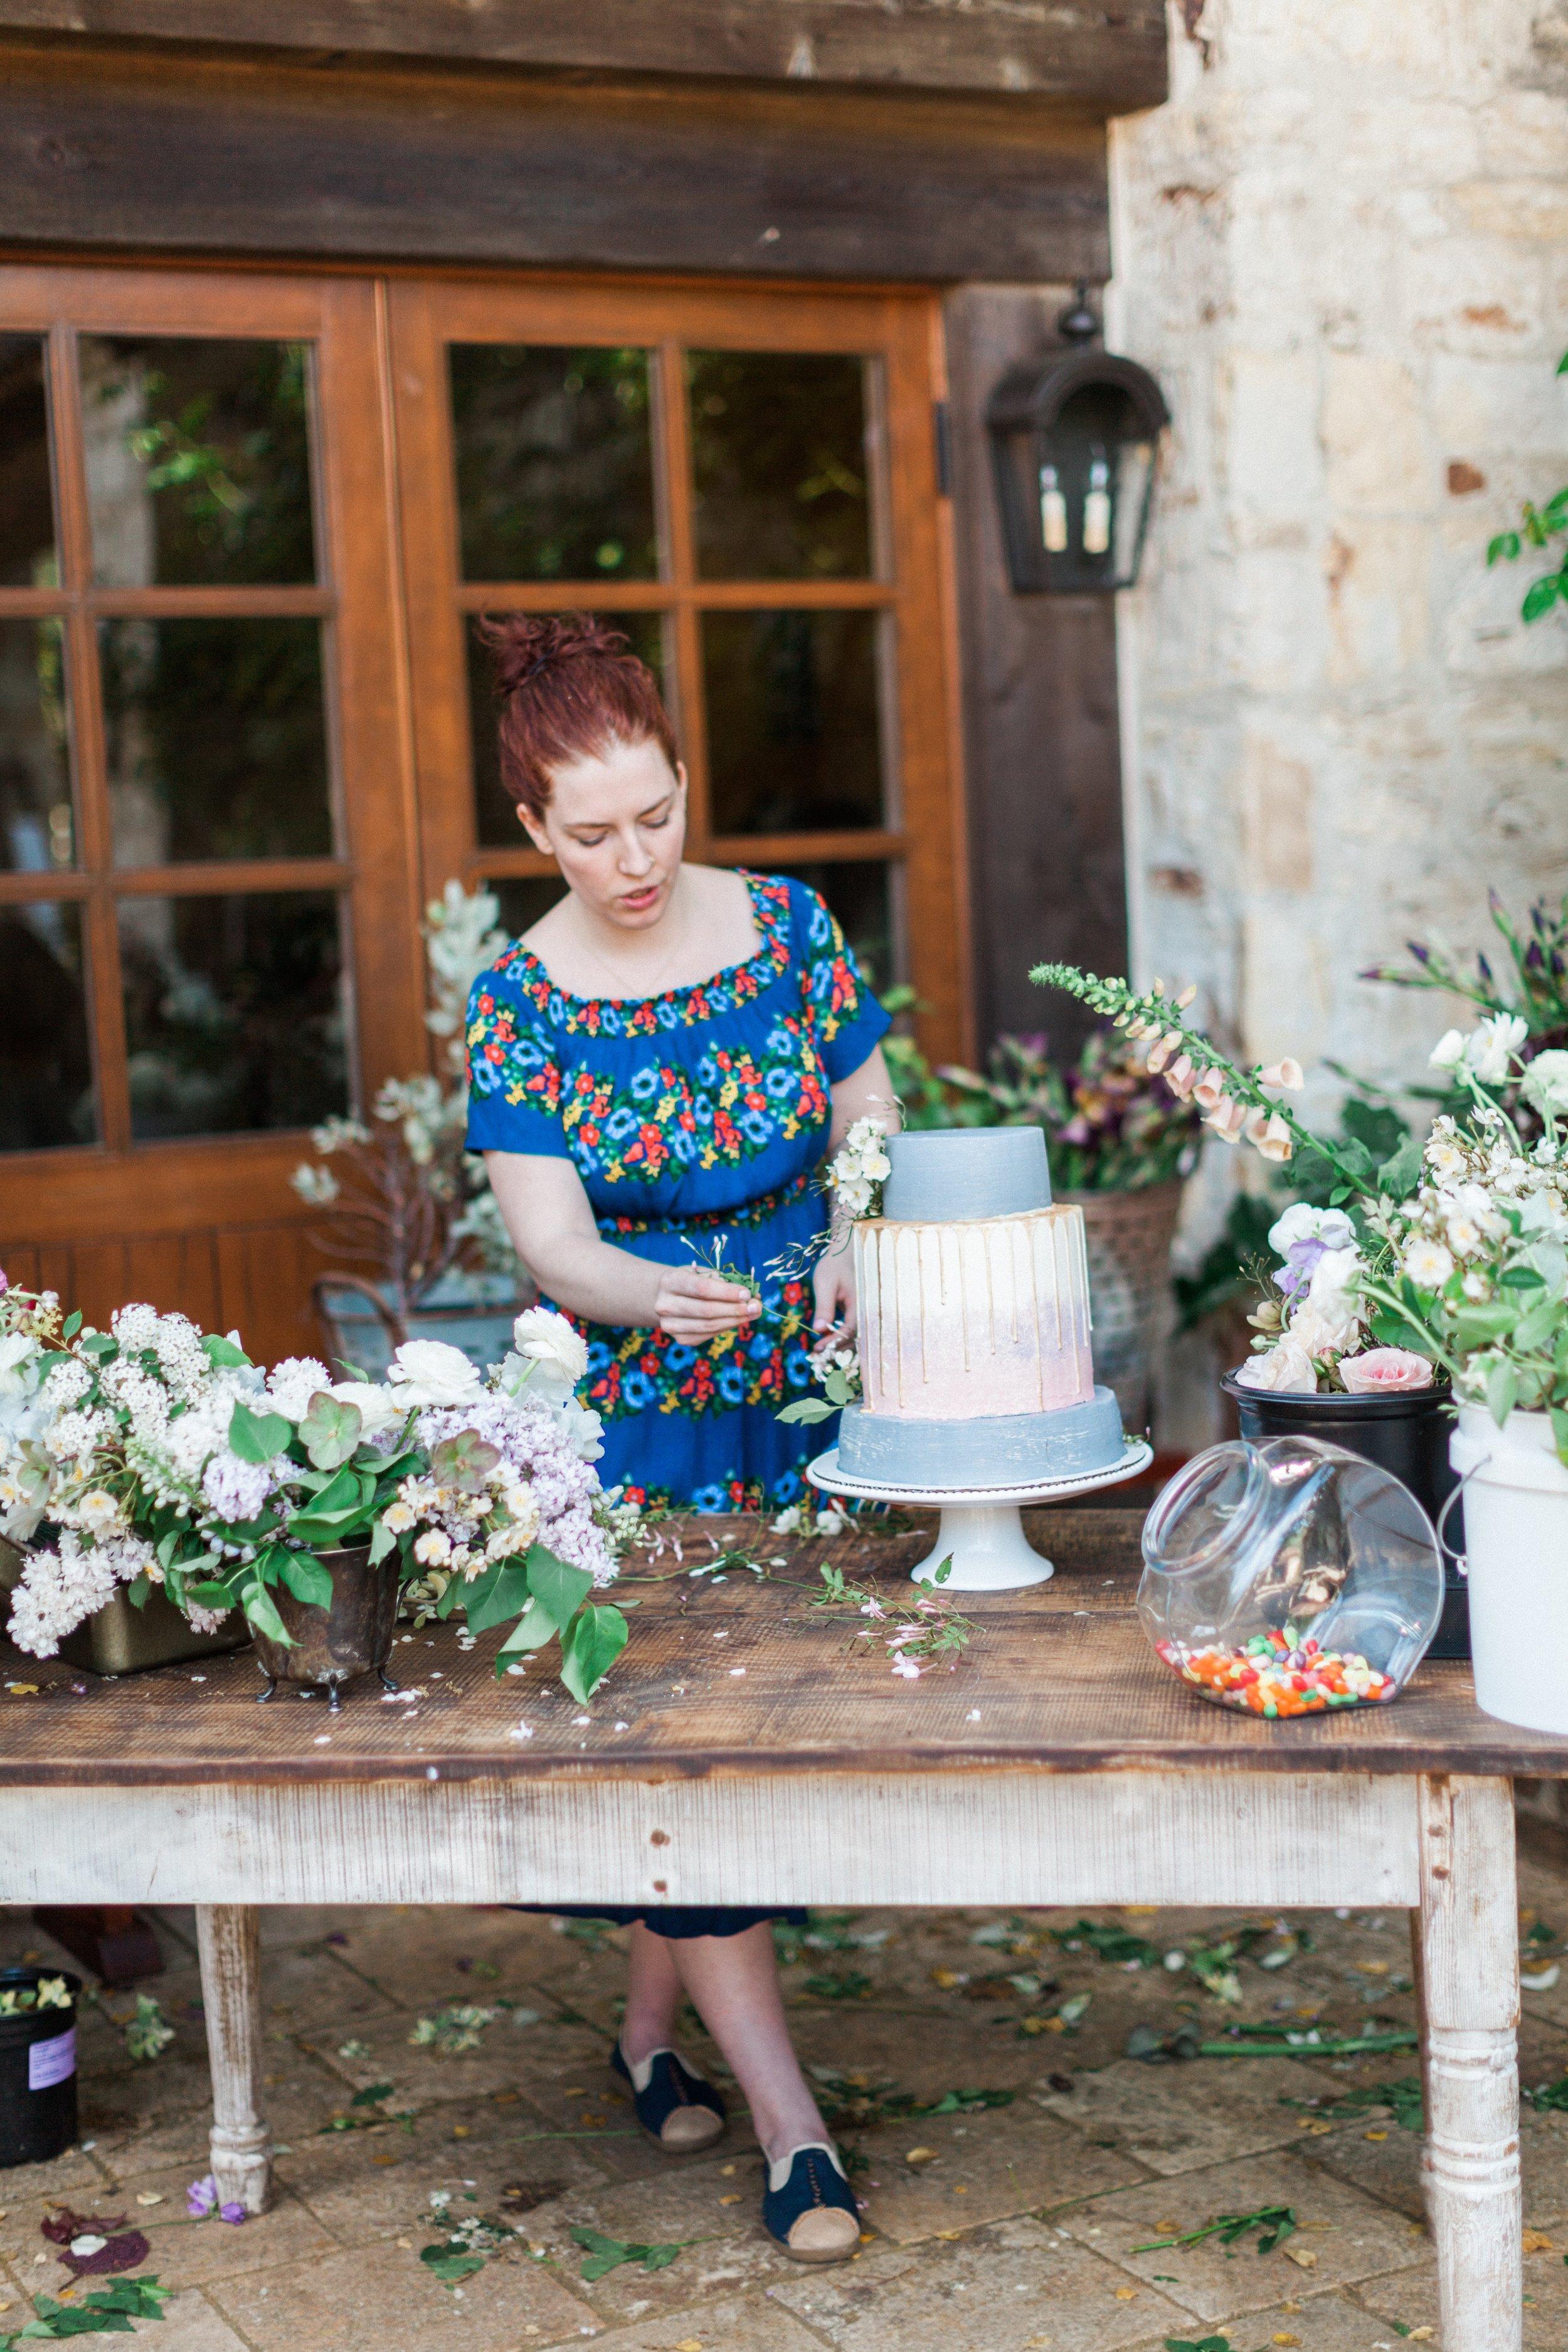 Ragi-and-Amanda-Bloom-Workshop-Carmel-339.jpg